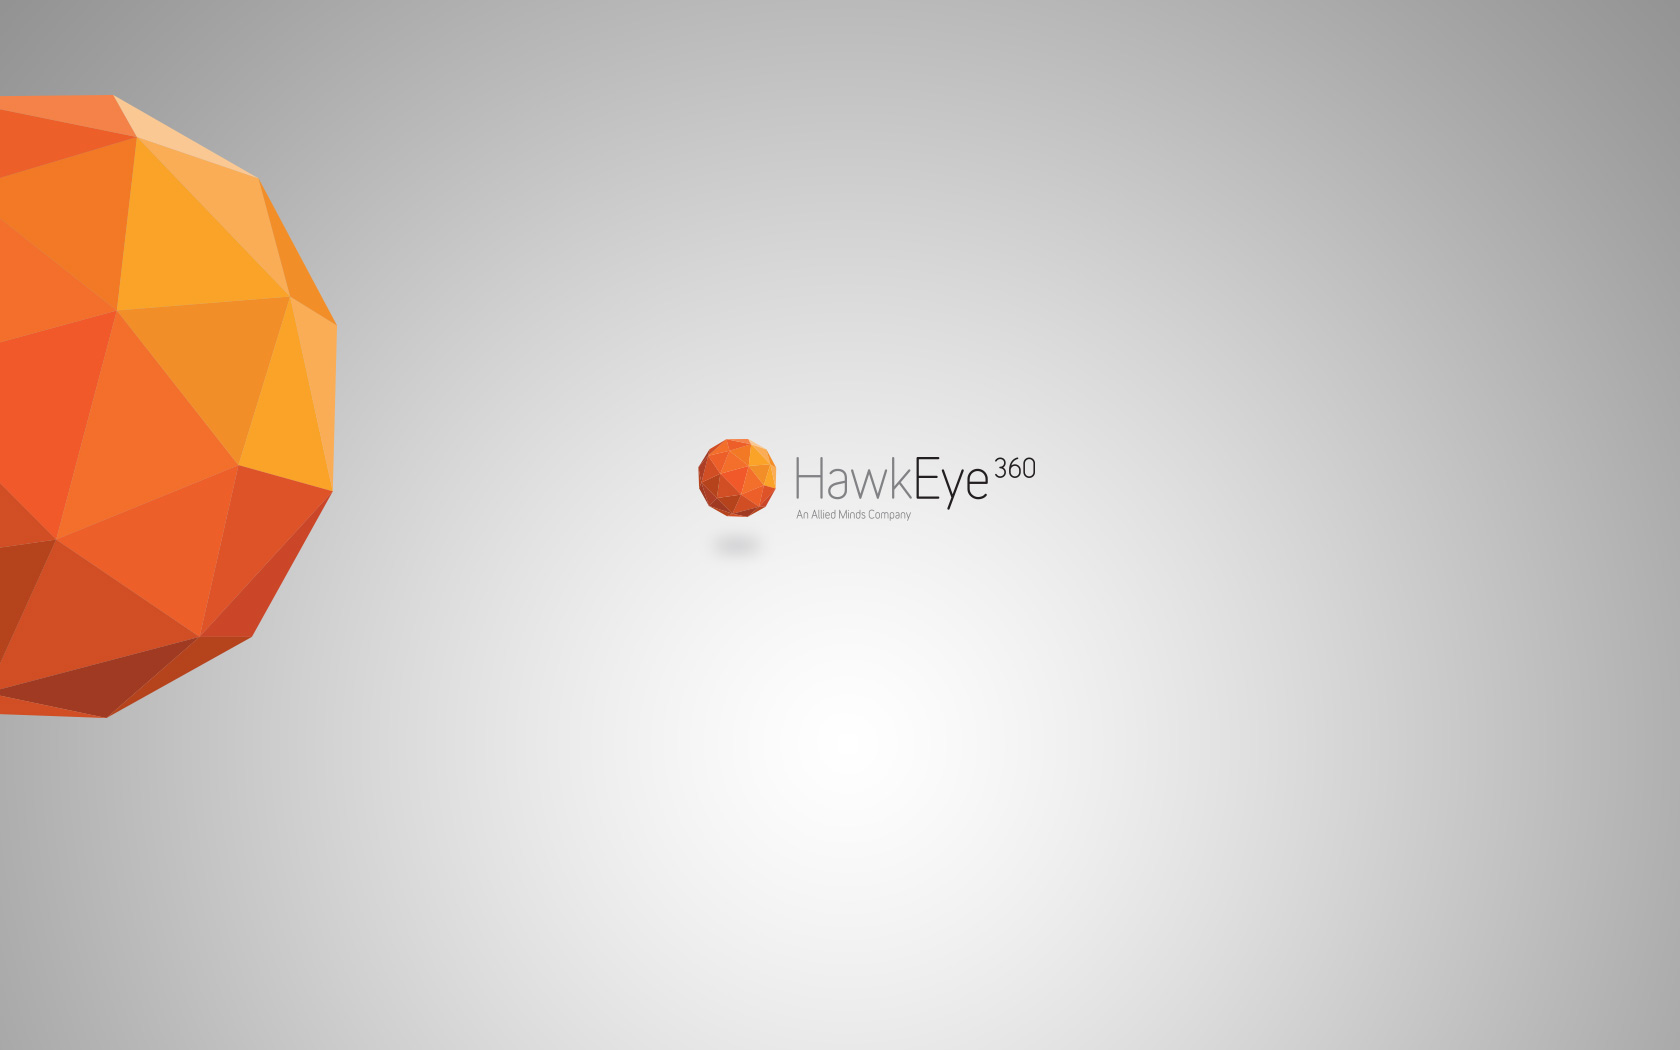 hawkeye360_X_MAMUS_CREATIVE_1